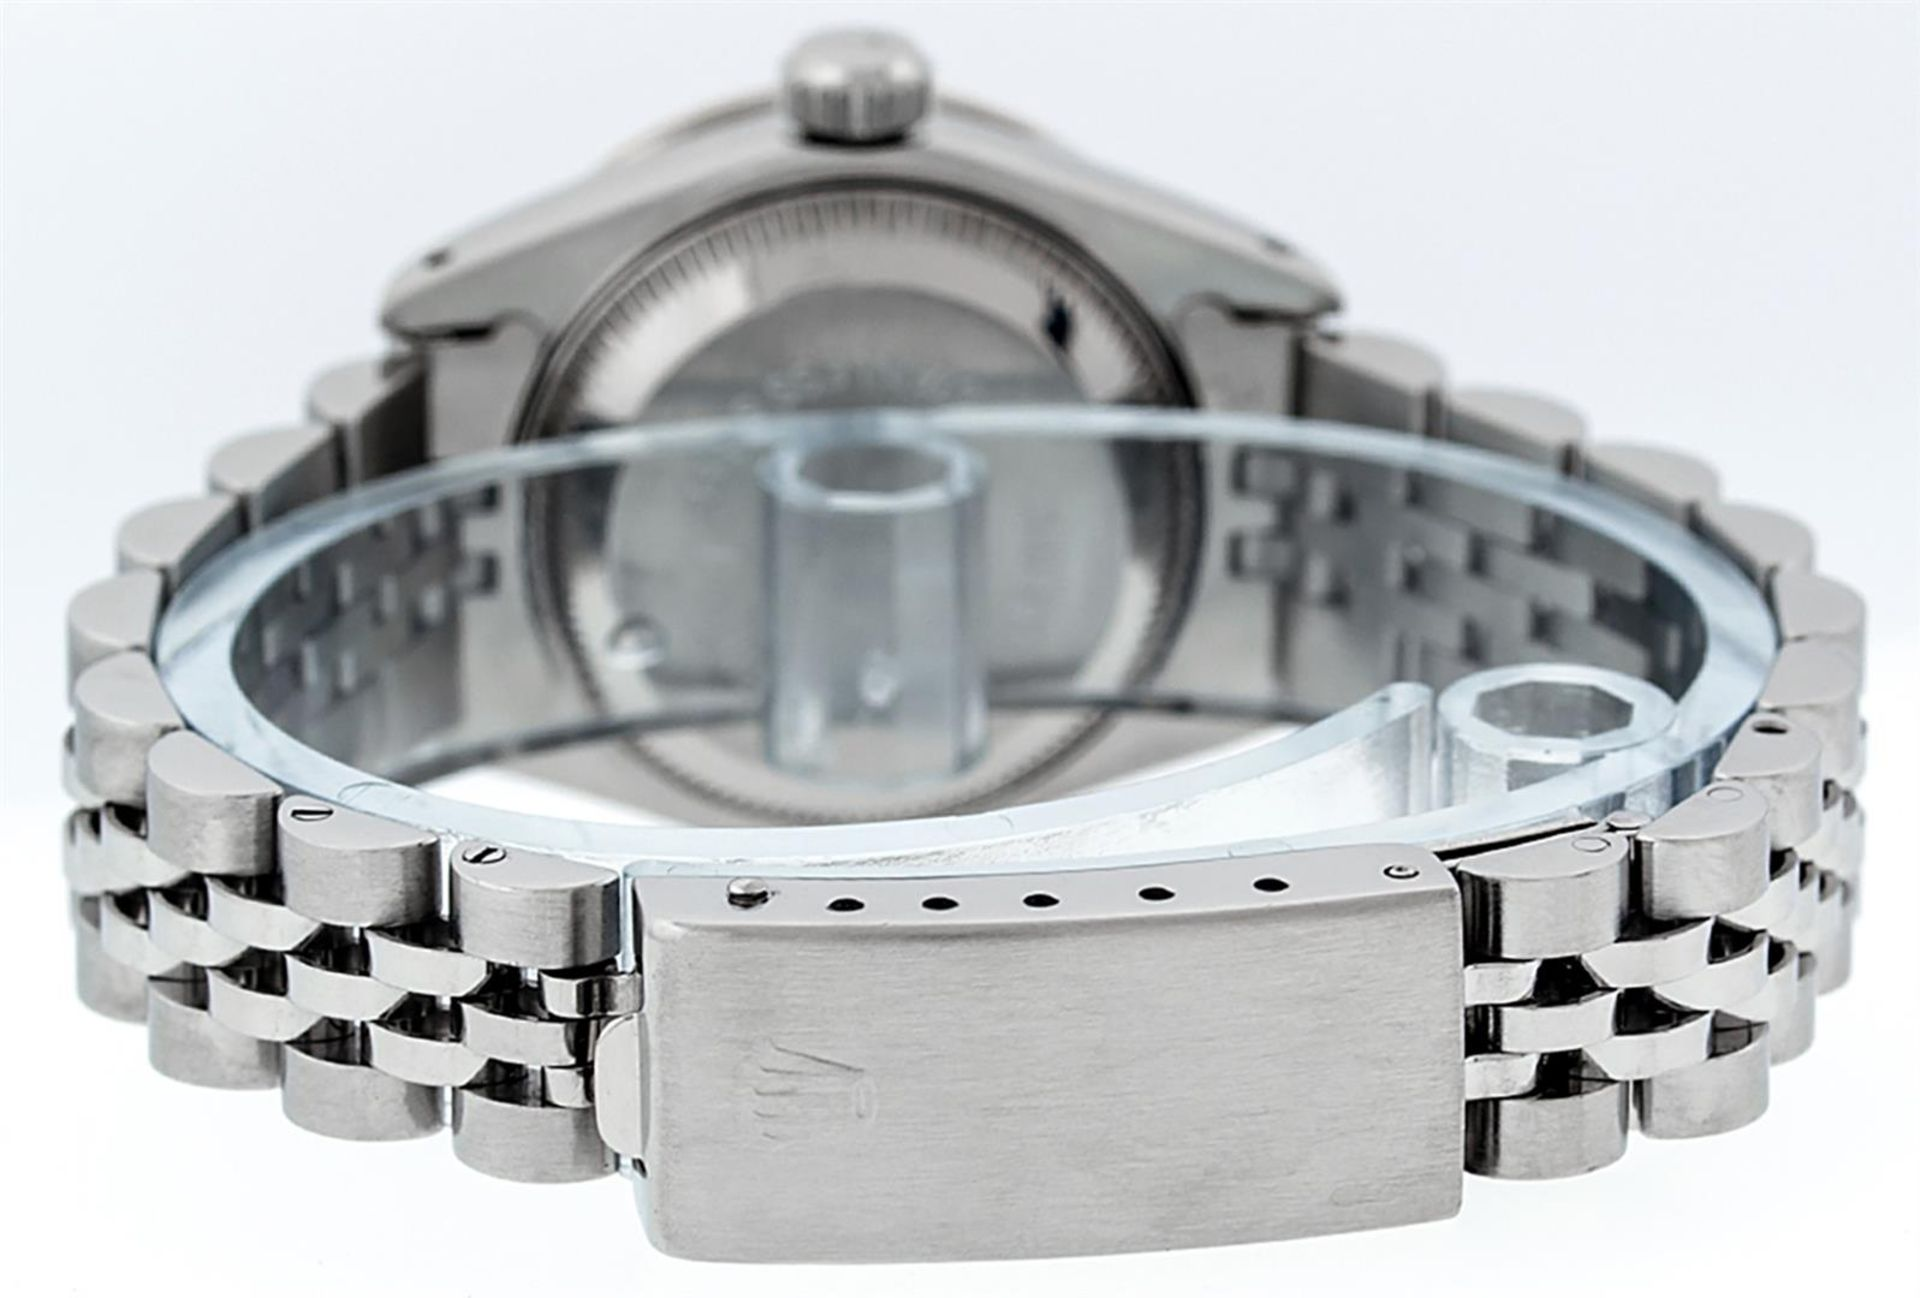 Rolex Ladies Stainless Steel 26MM Purple String Diamond Lugs Datejust Wristwatch - Image 8 of 9